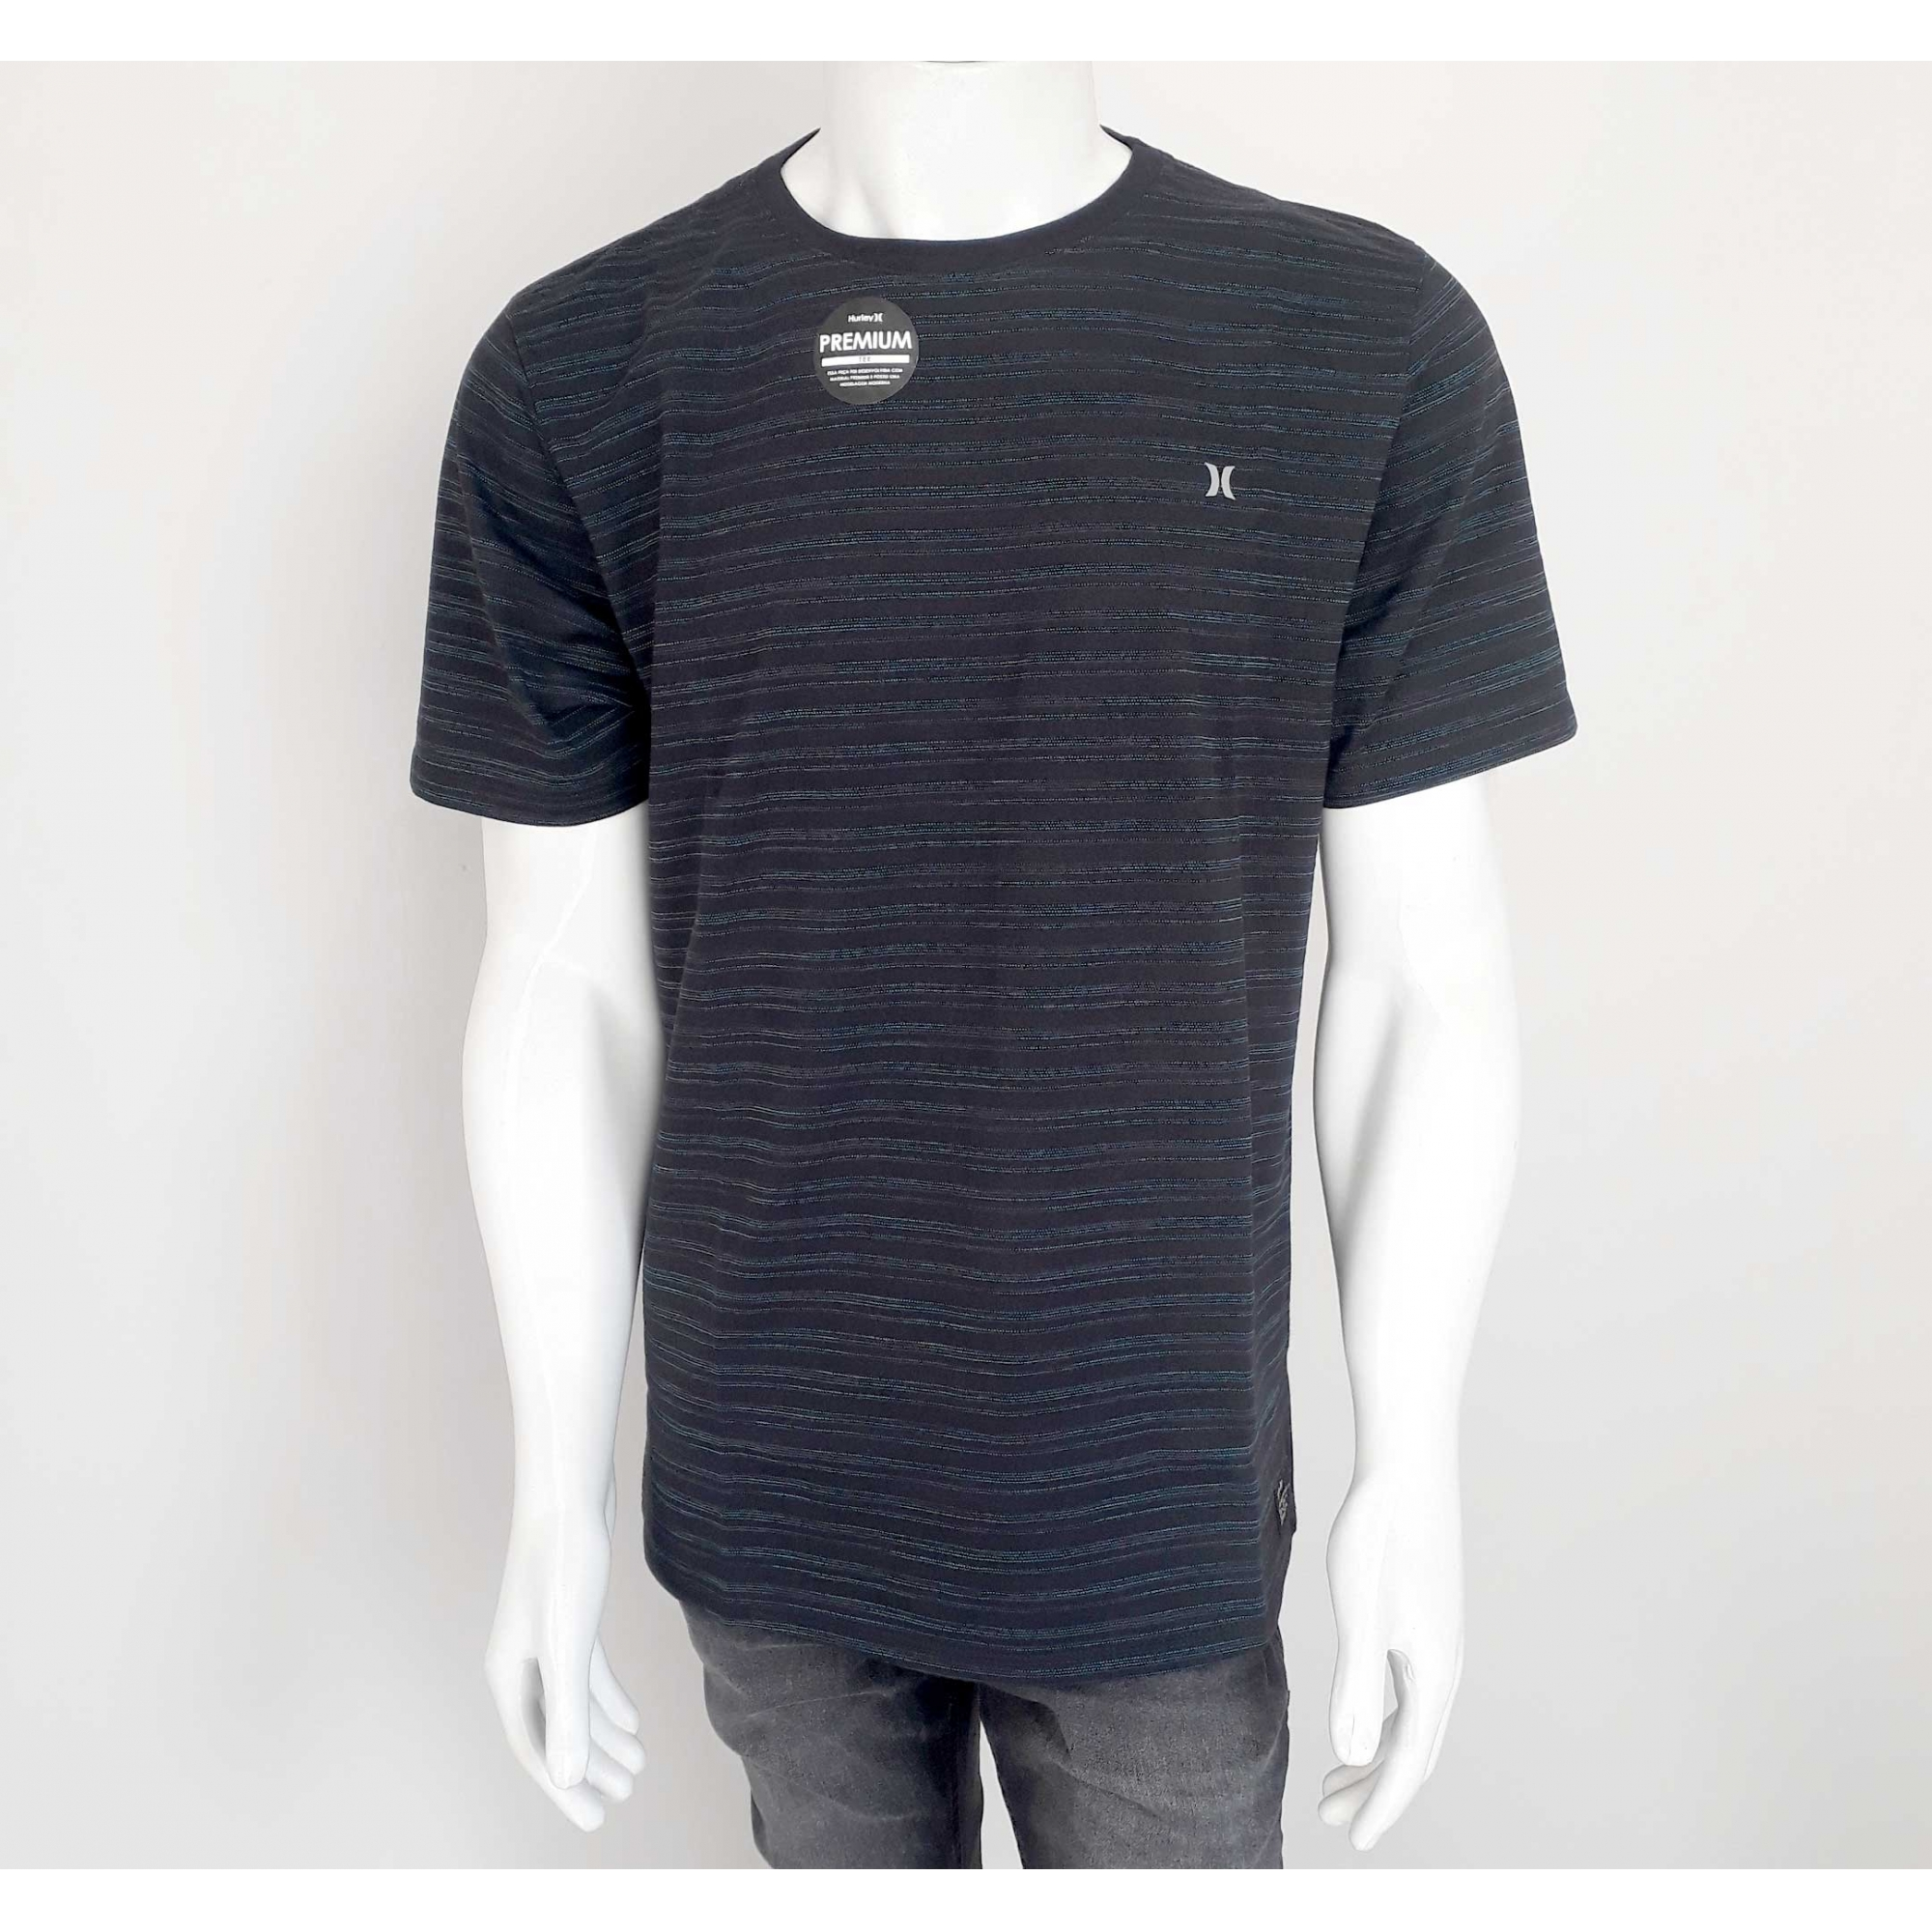 Camiseta Hurley Especial 639110 - GG